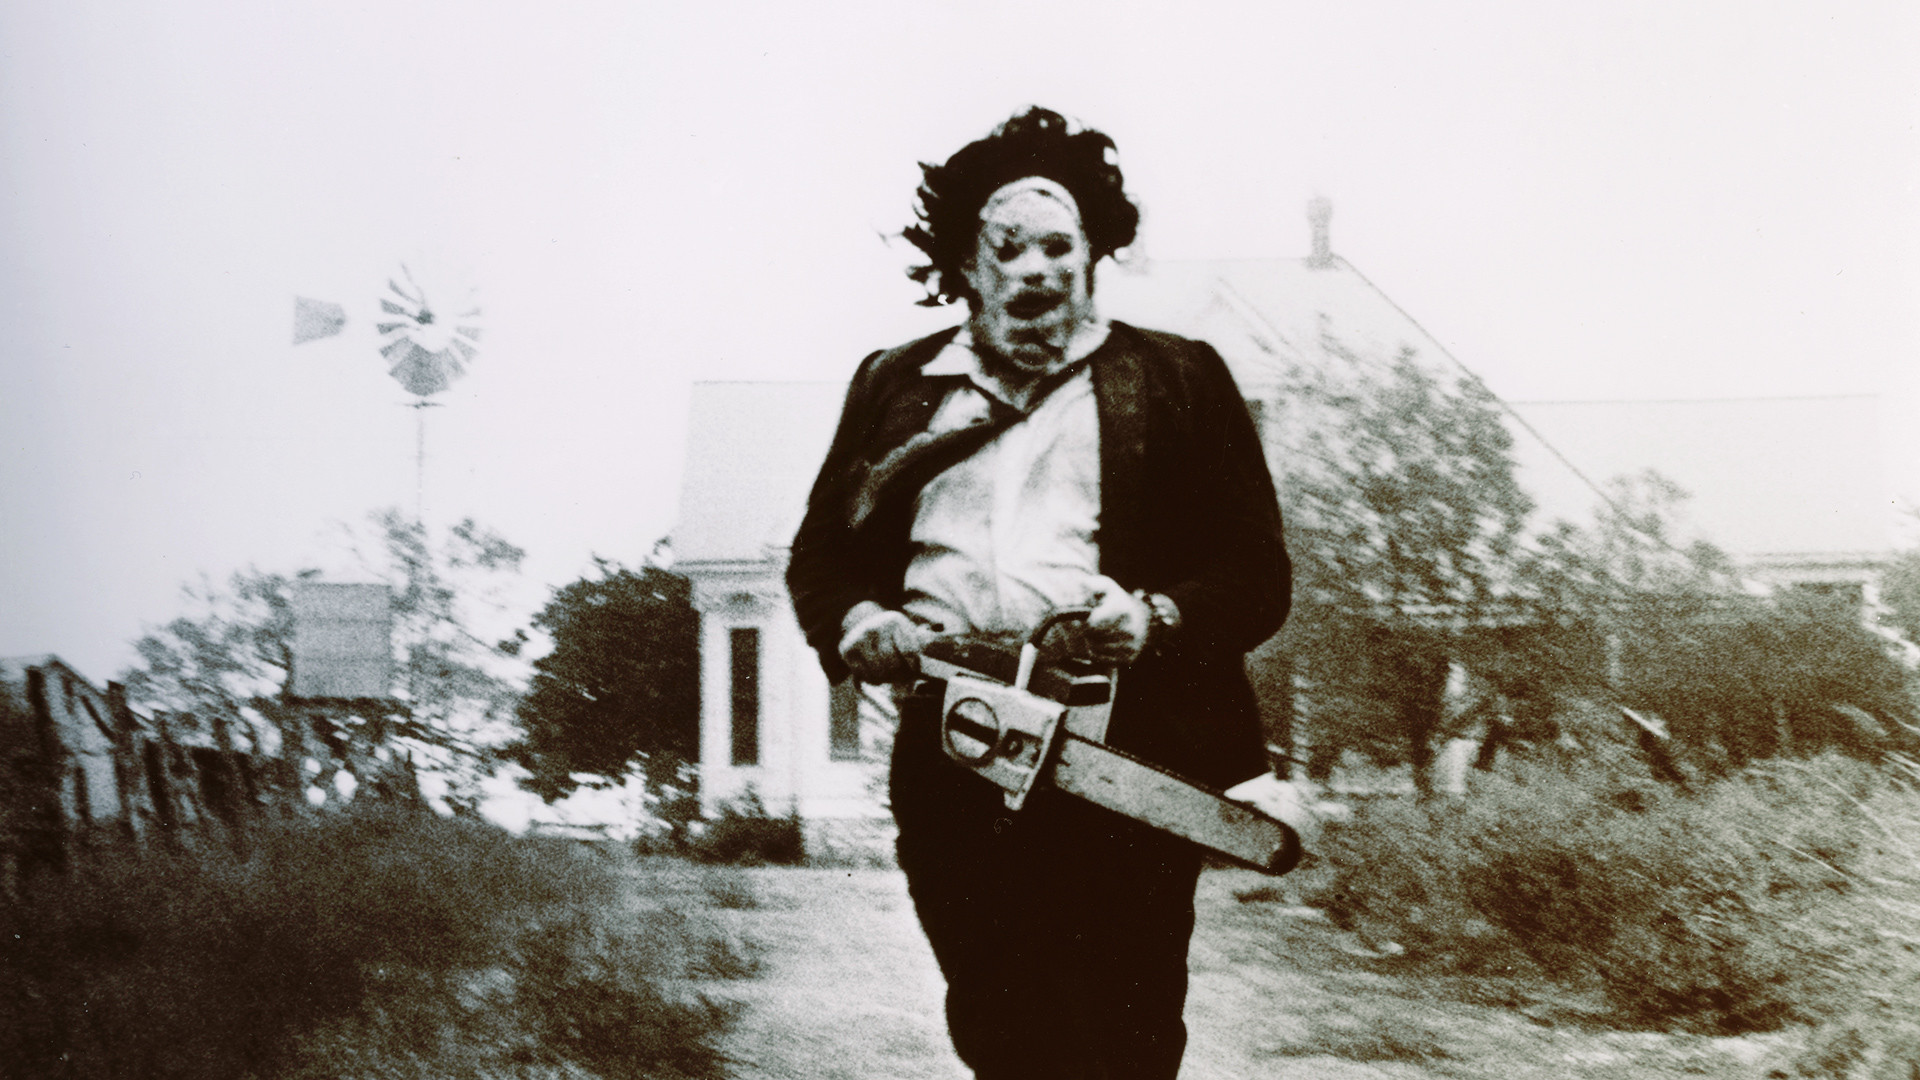 Image via The Texas Chainsaw Massacre Wiki